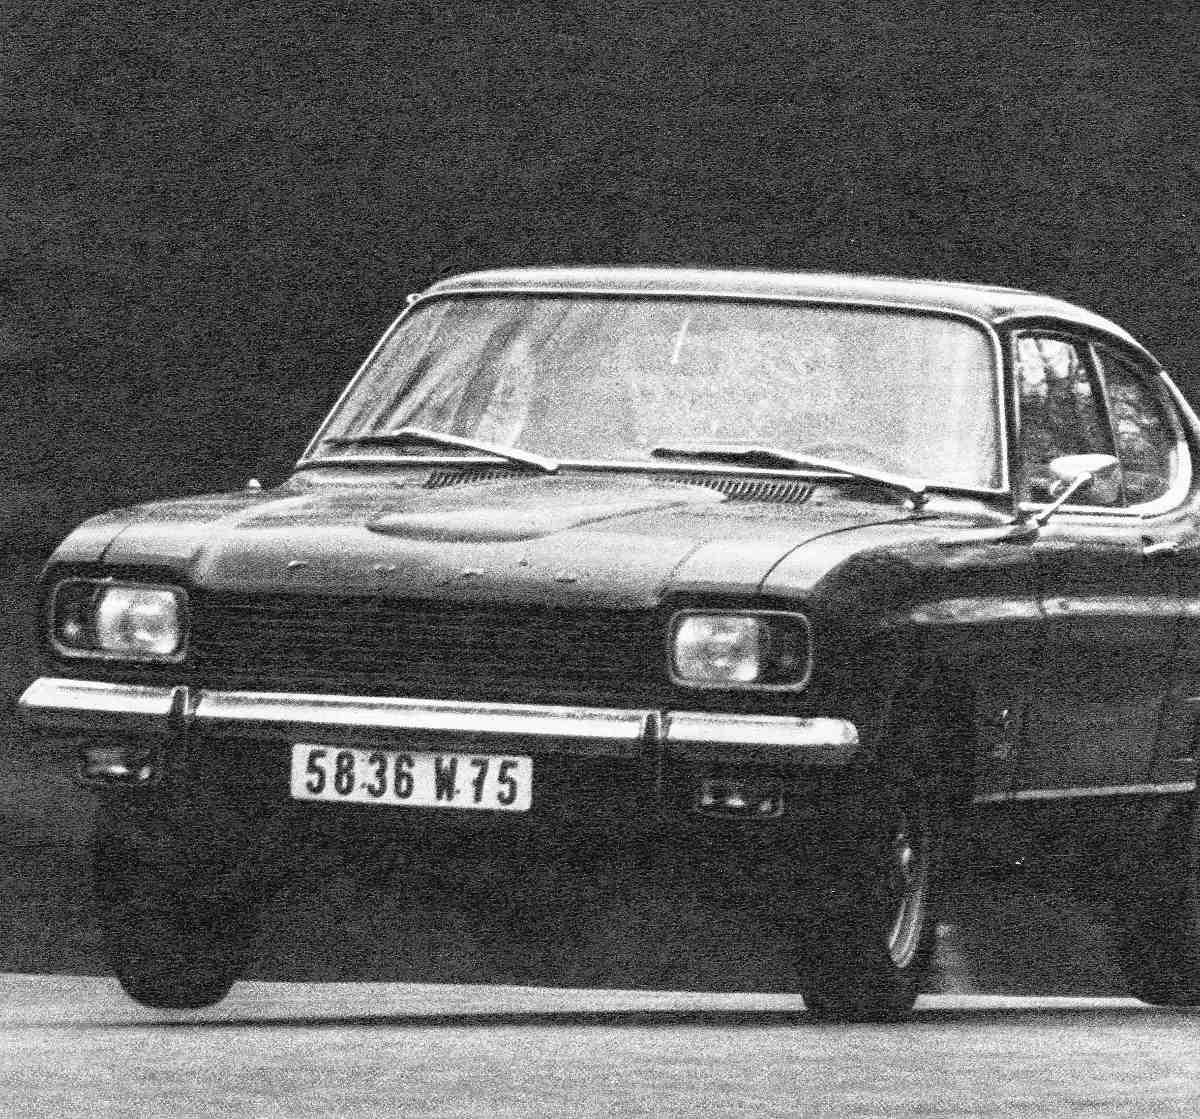 Ford Capri 2300 GT